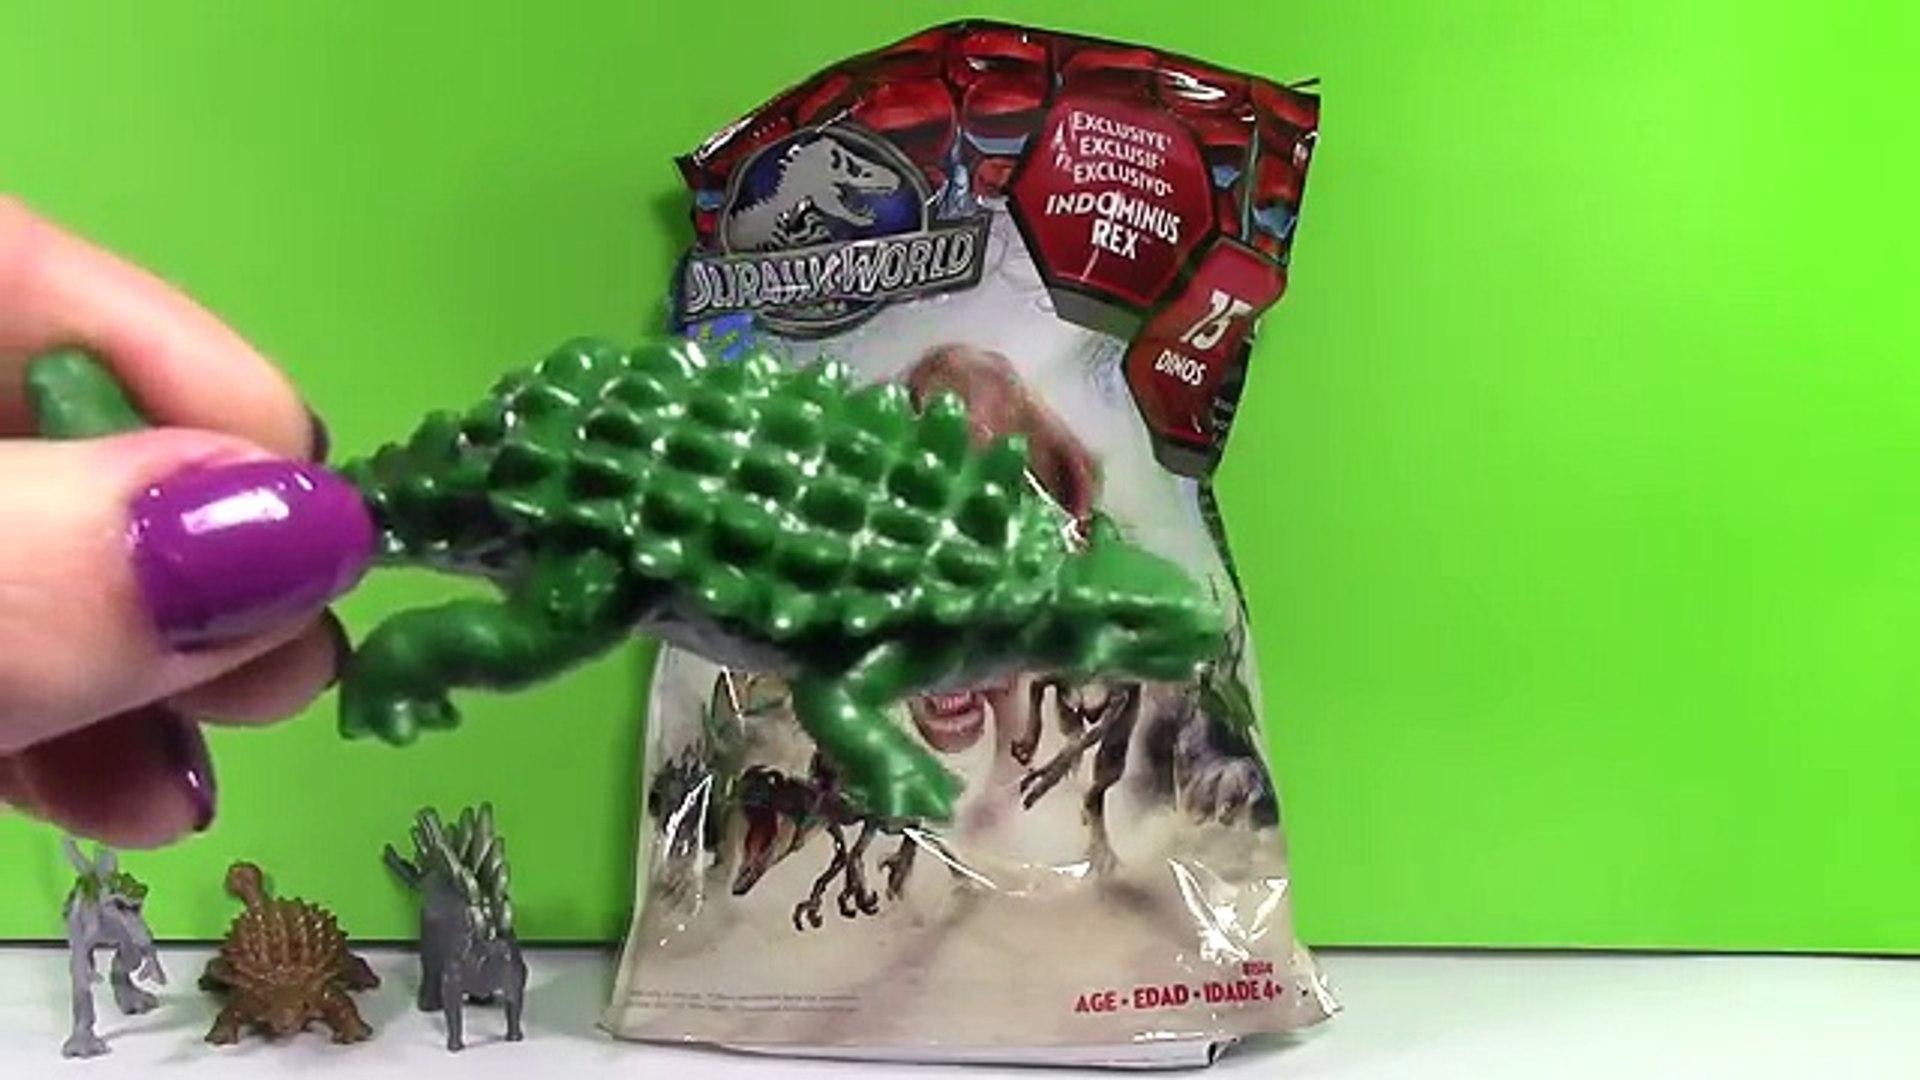 Jurassic world Surprise Jurassic World Sorpresas - Juguetes de Dinosaurios, videos de dinosaurios